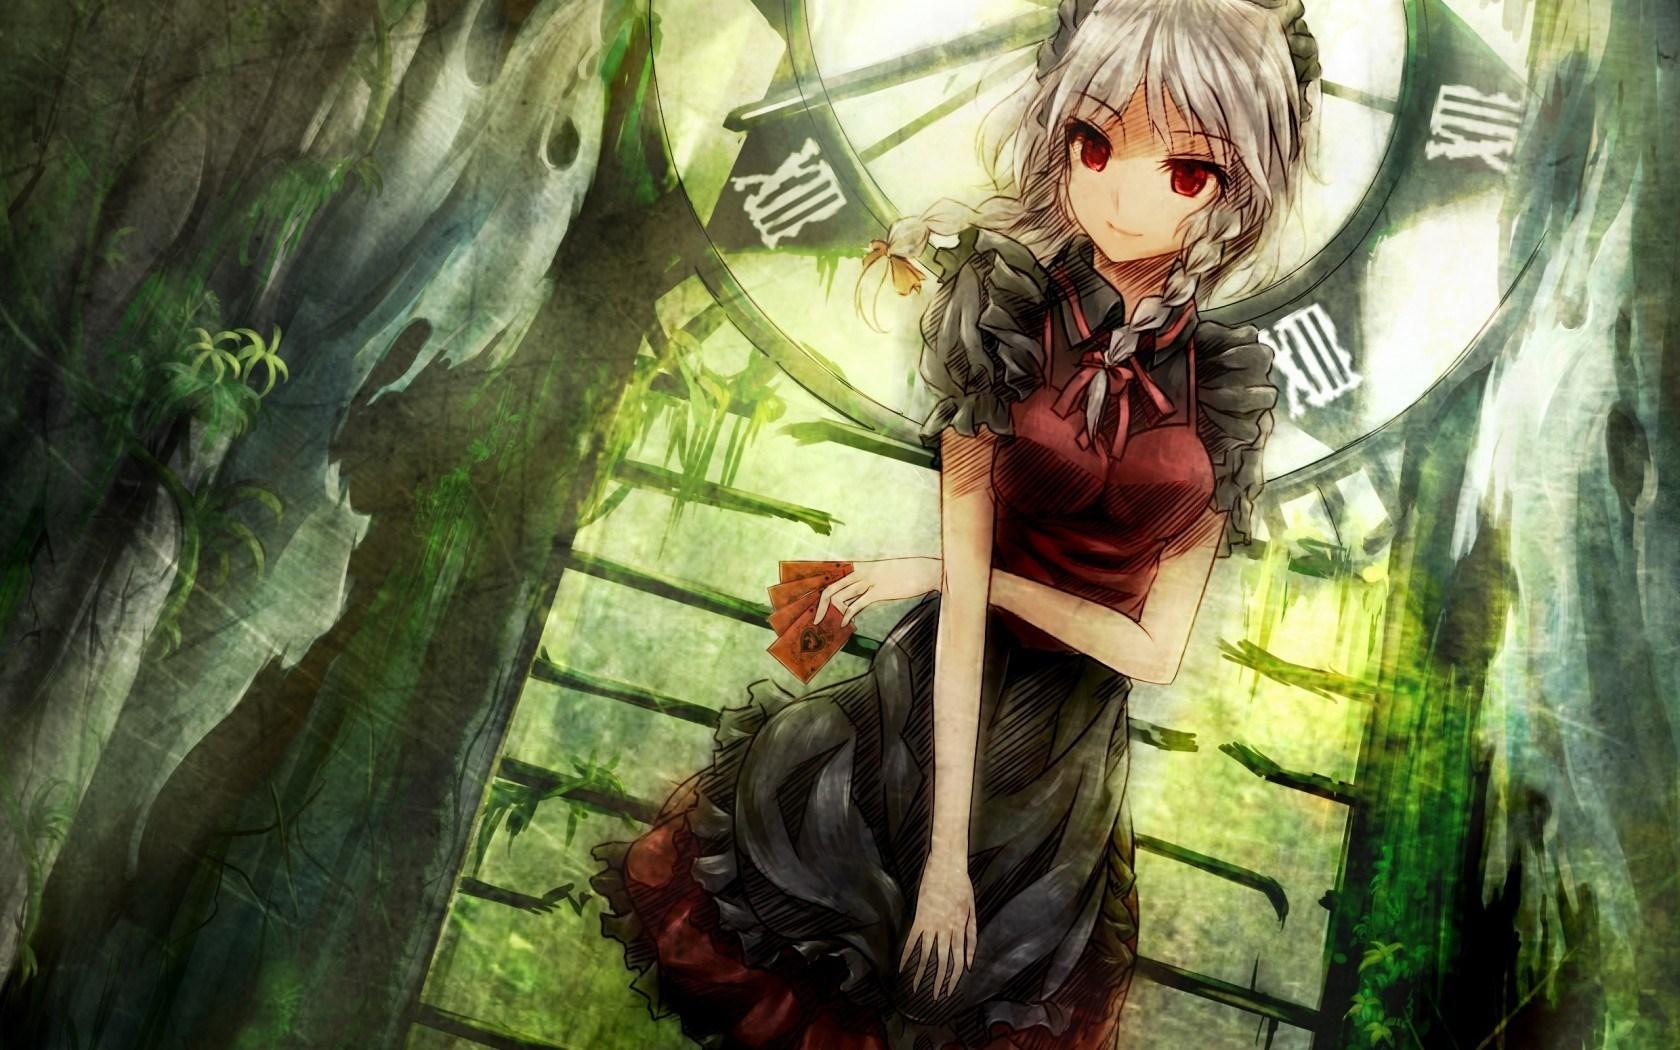 Green Anime Wallpaper - Anime Girls Arts Hd - HD Wallpaper